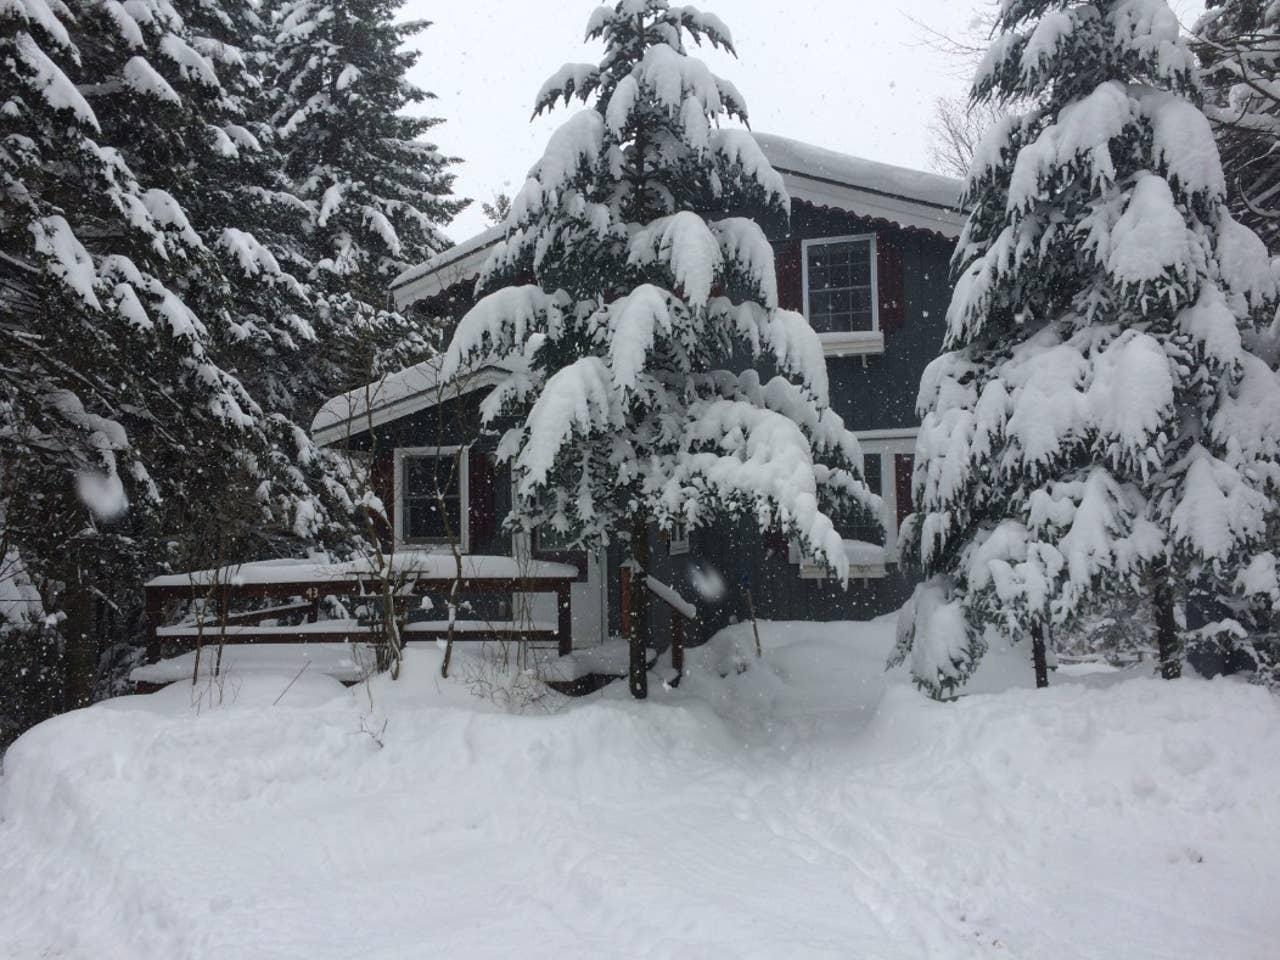 Wanderwood - a 4 bedroom alpine chal